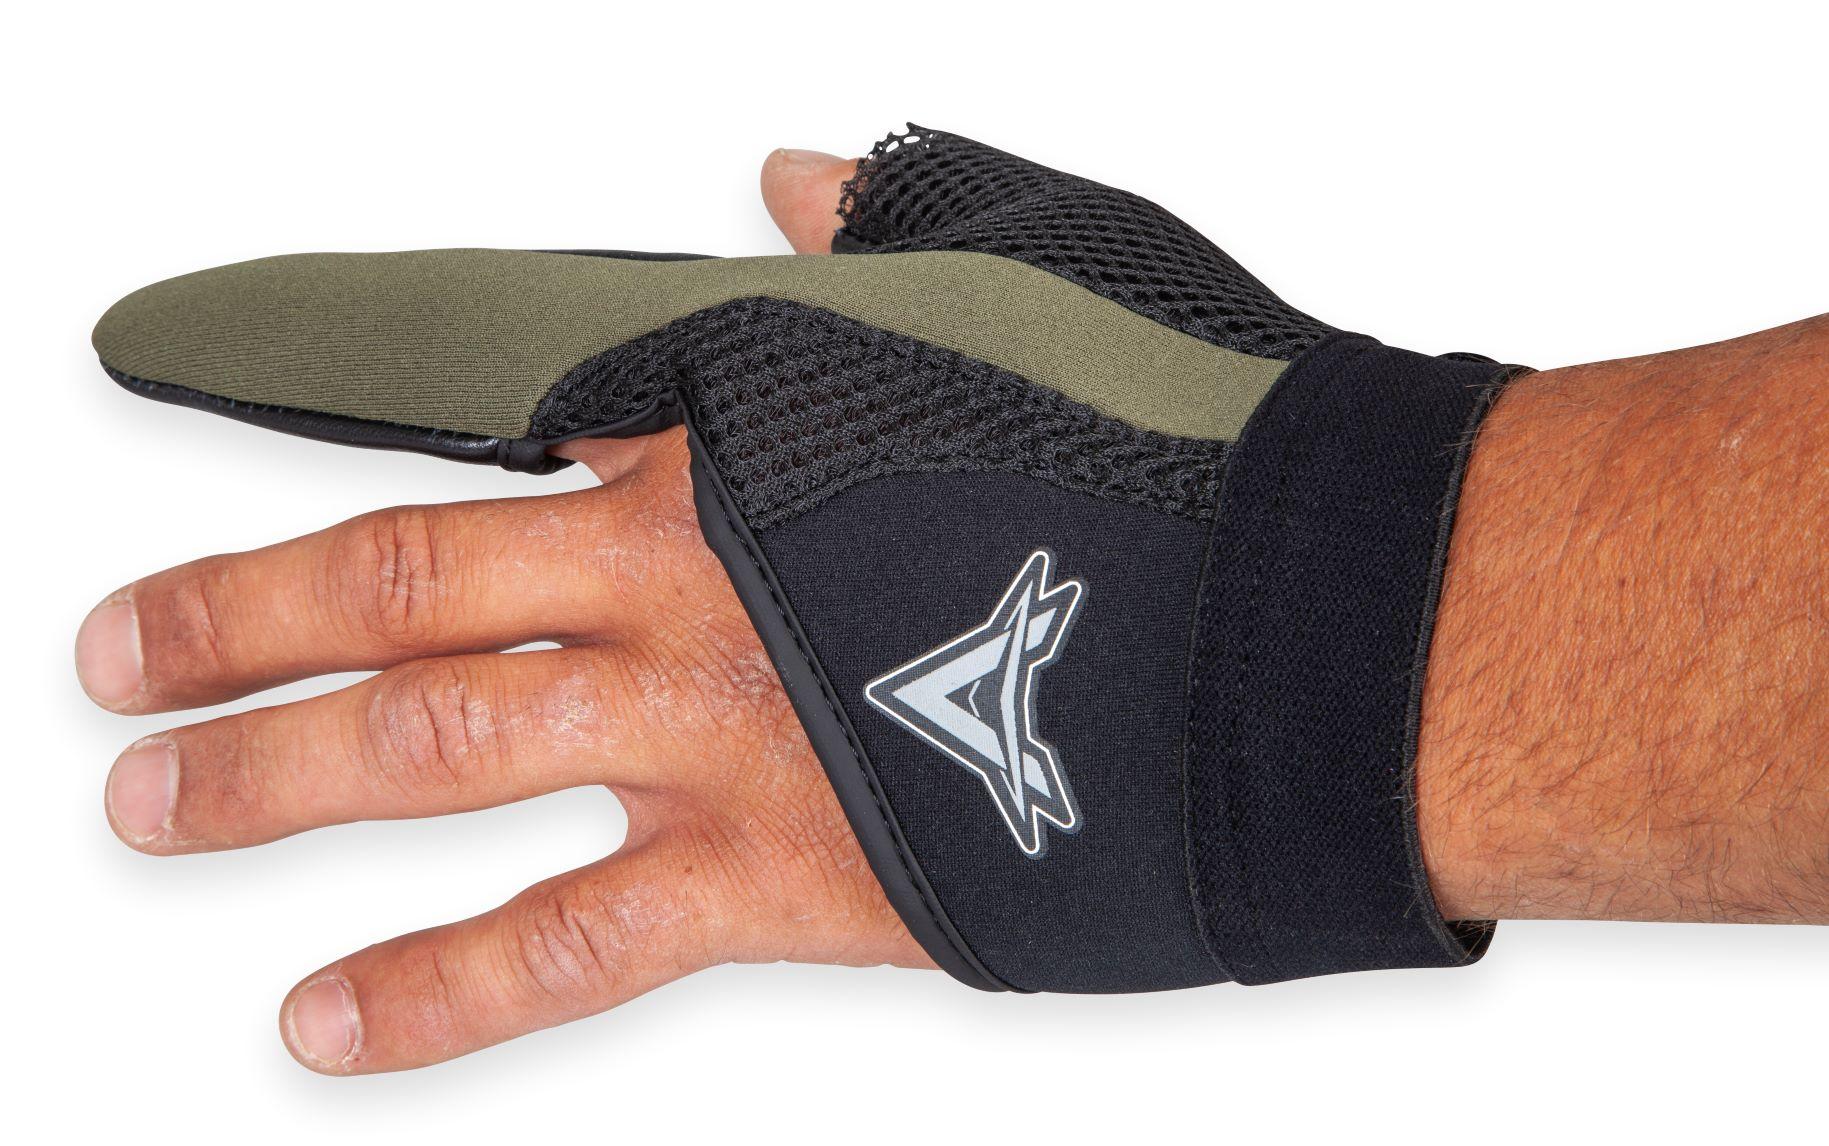 Anaconda rukavice Profi Casting Glove, levá, vel. M